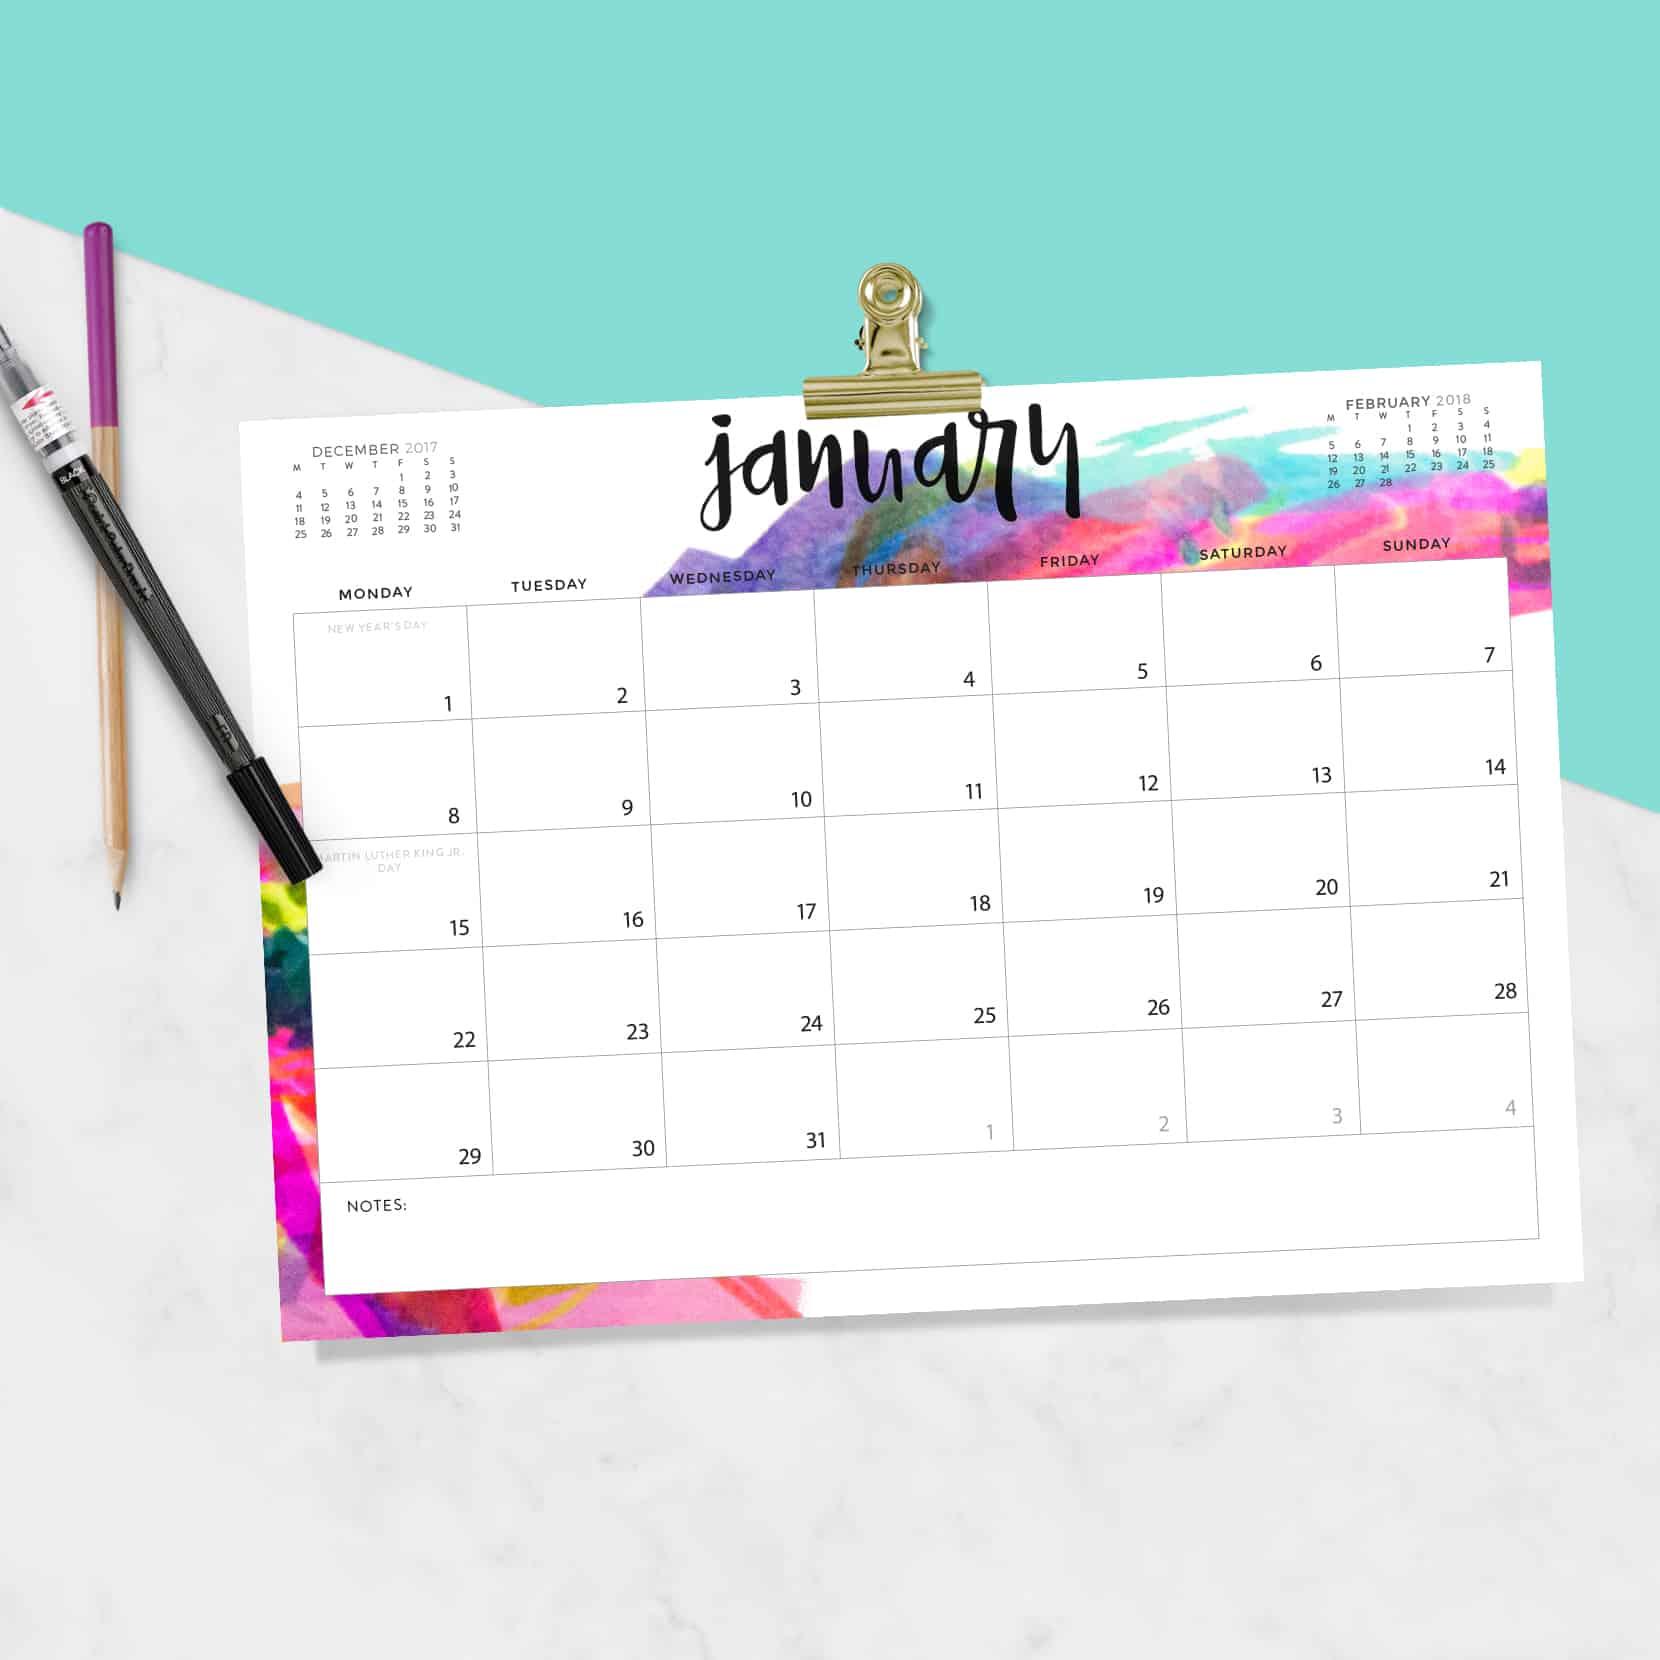 Great Wallpaper Marble Calendar - FREE2018PrintableCalendar  Picture_483533.jpg?resize\u003d1024%2C1024